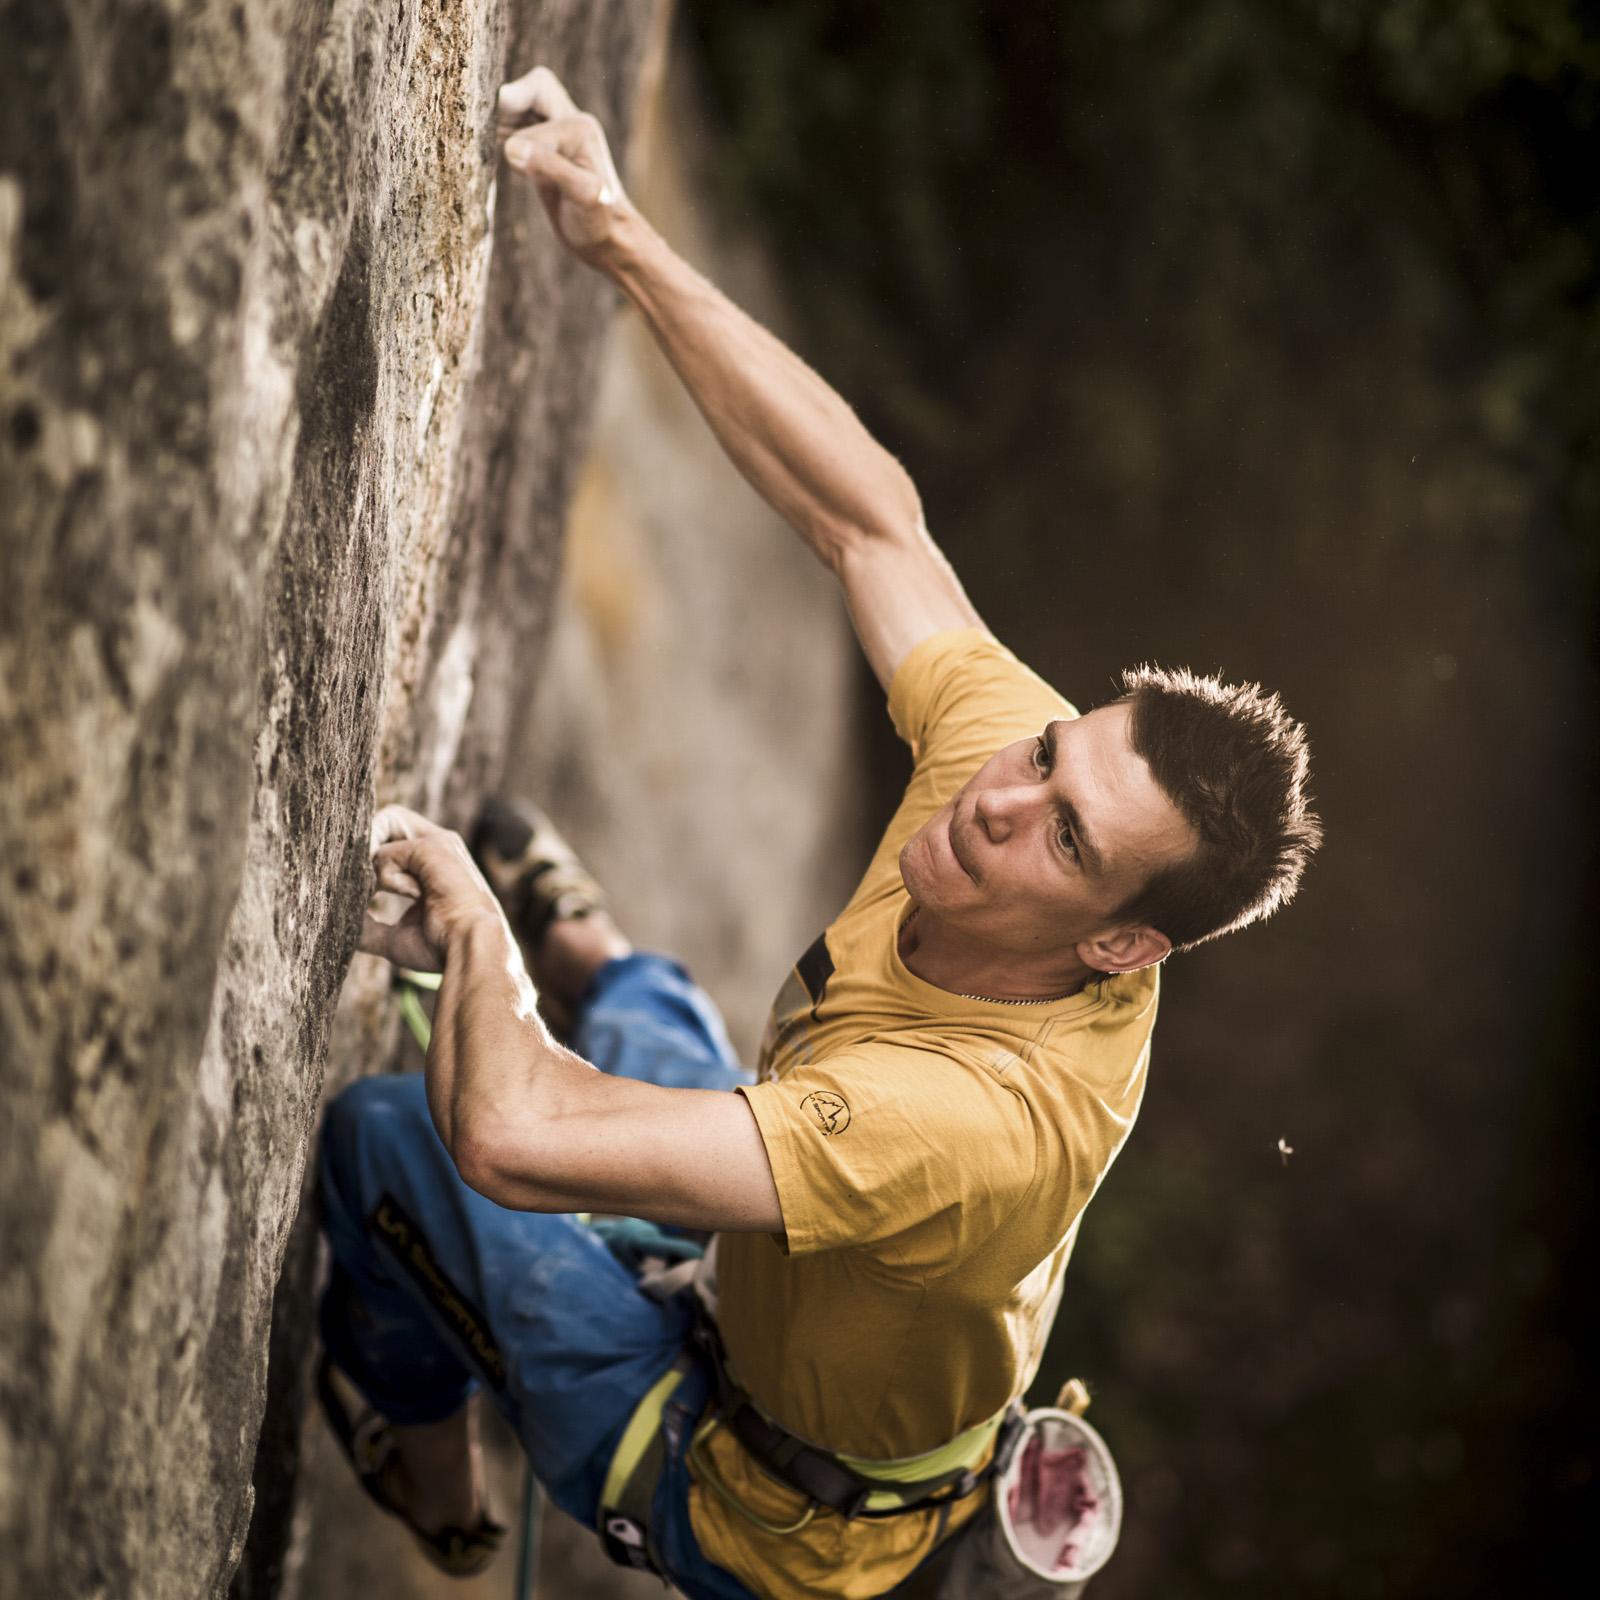 "Klettern, Kevin Hemund, Saint Loup, Route ""Bain de Sang"" 9a, David Schweizer, Climbing, Outdoorfotografie, Sportfotografie"